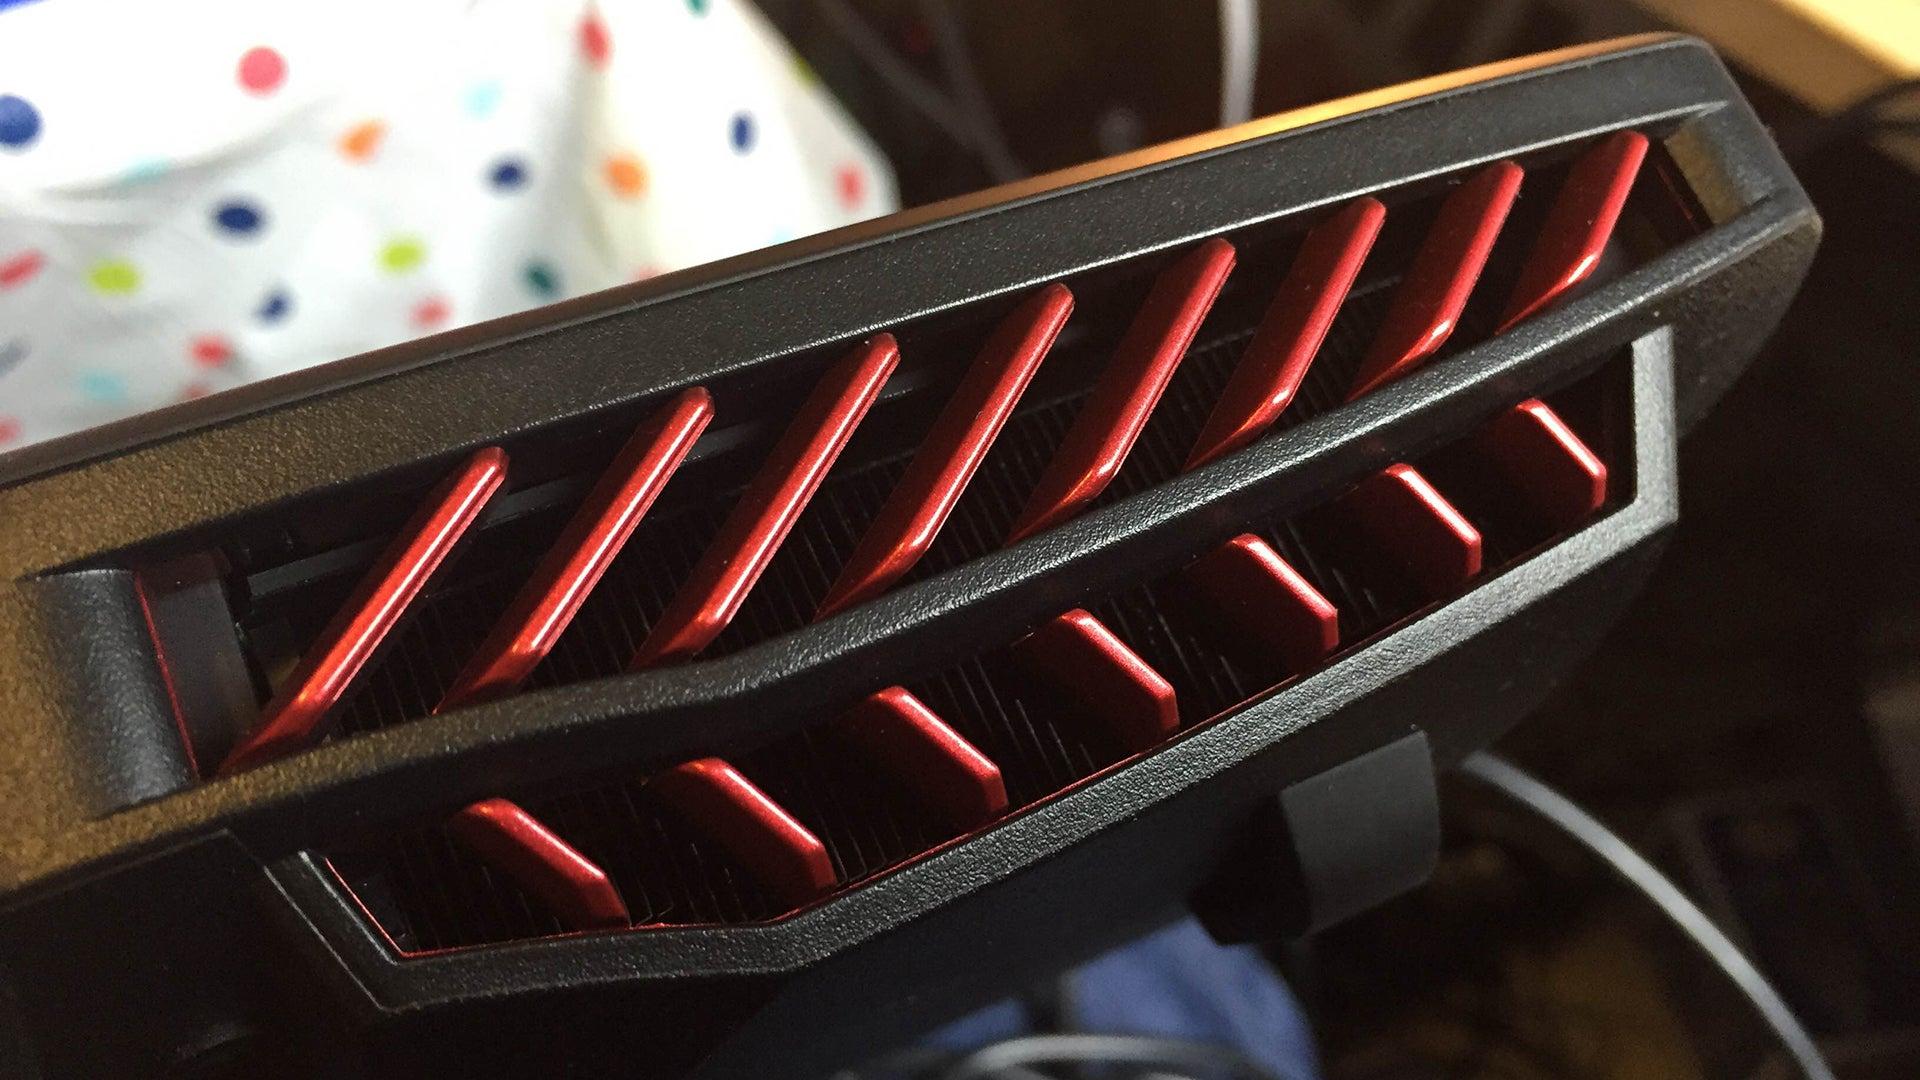 Asus ROG G751JY-DH71 Gaming Laptop: The Kotaku Review